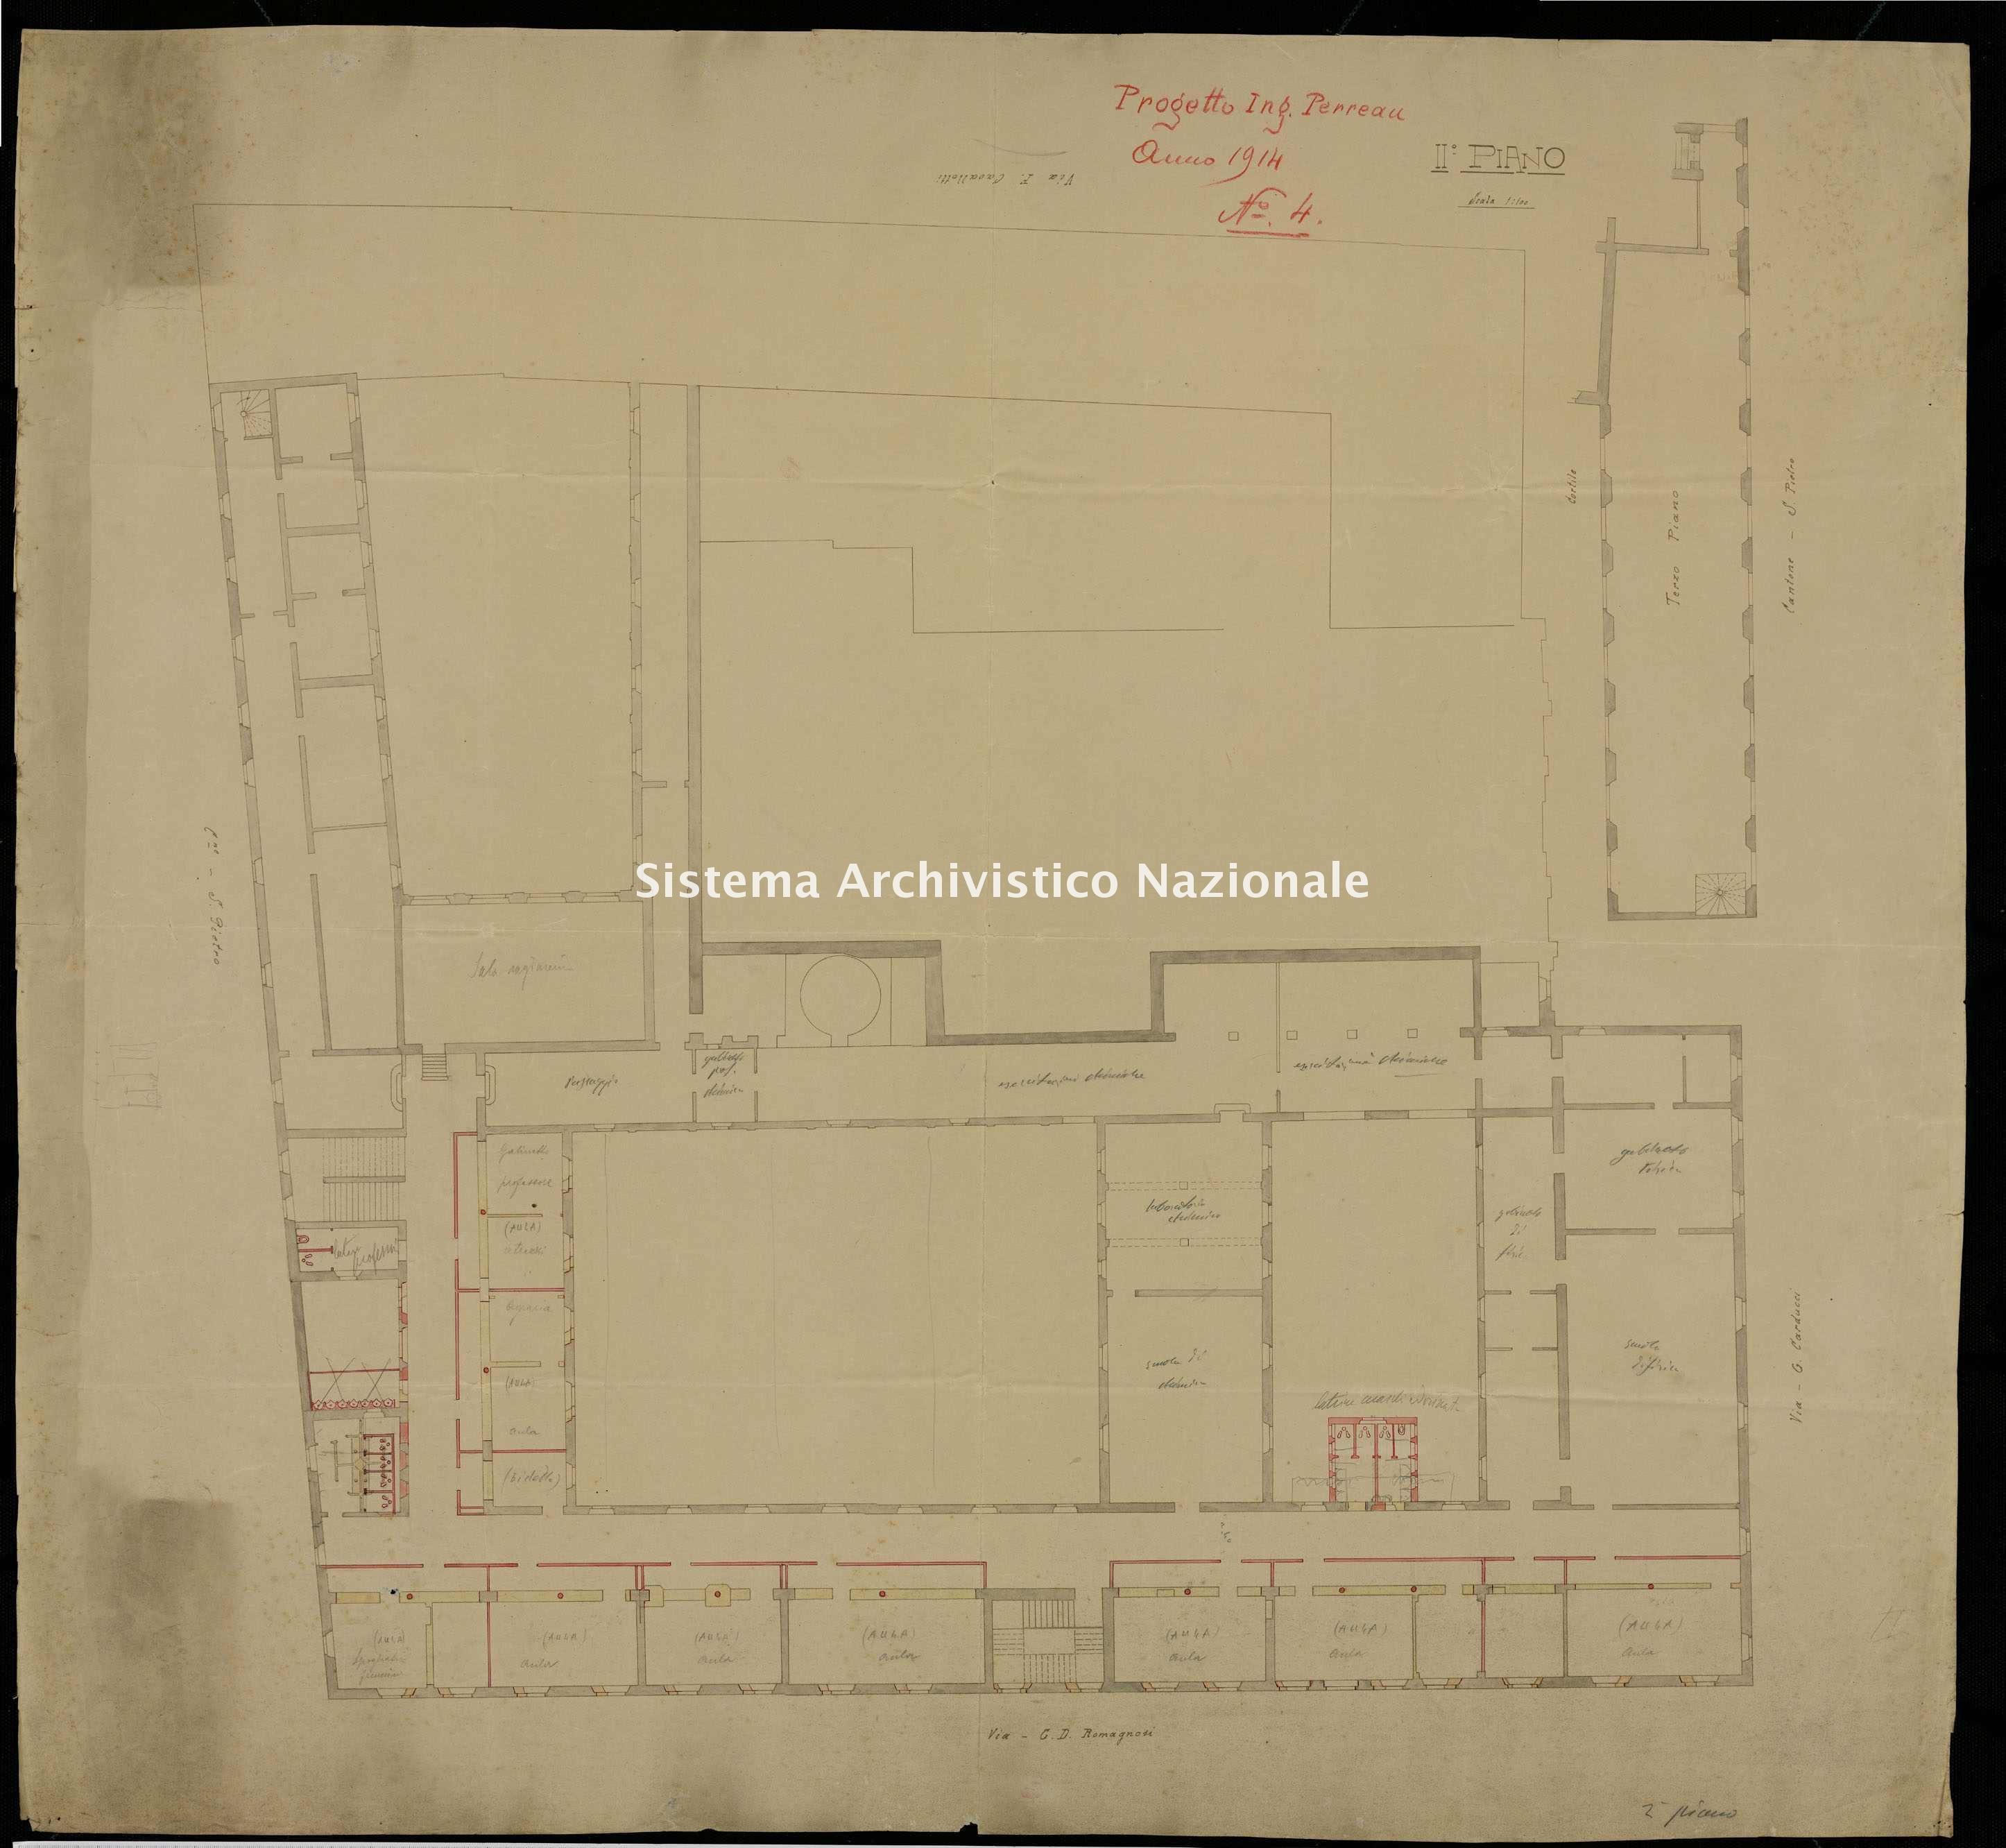 ASPC Mappe, stampe e disegni, n. 5109